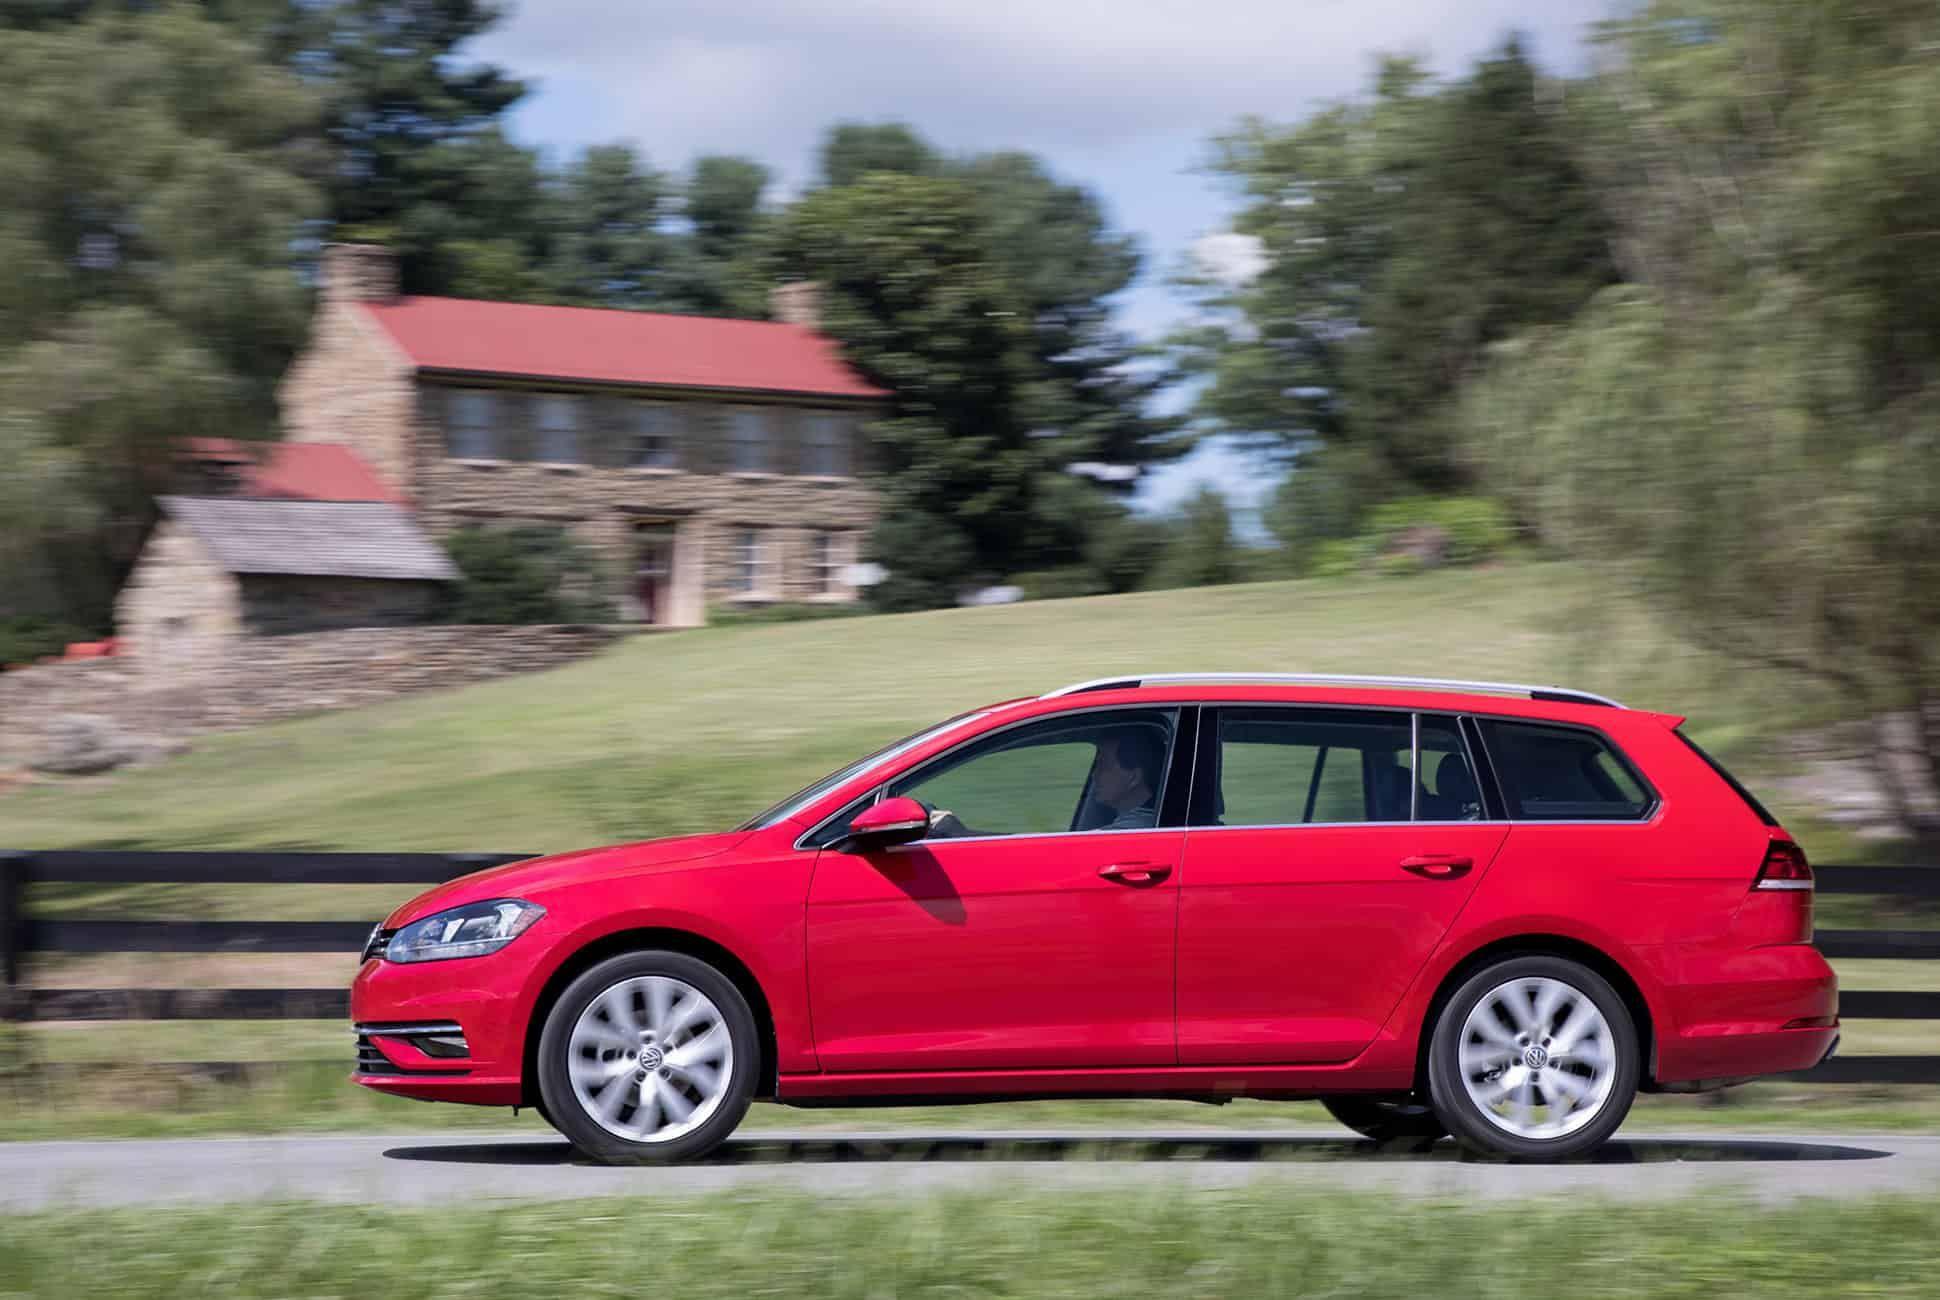 Volkswagen-Sportwagen-Review-gear-patrol-slide-5